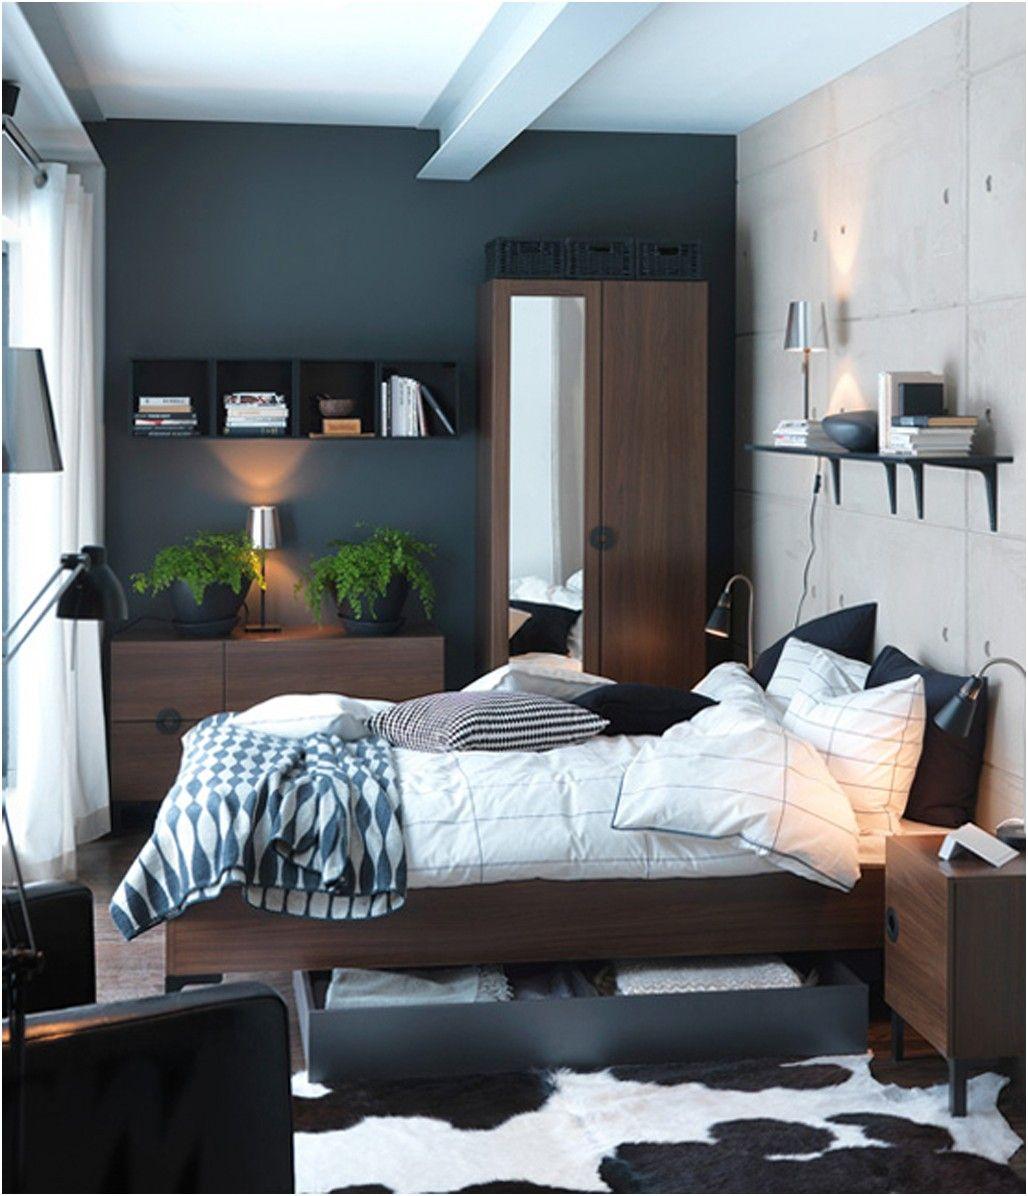 ikea bedroom ideas hemnes - Google Search | Small master ...